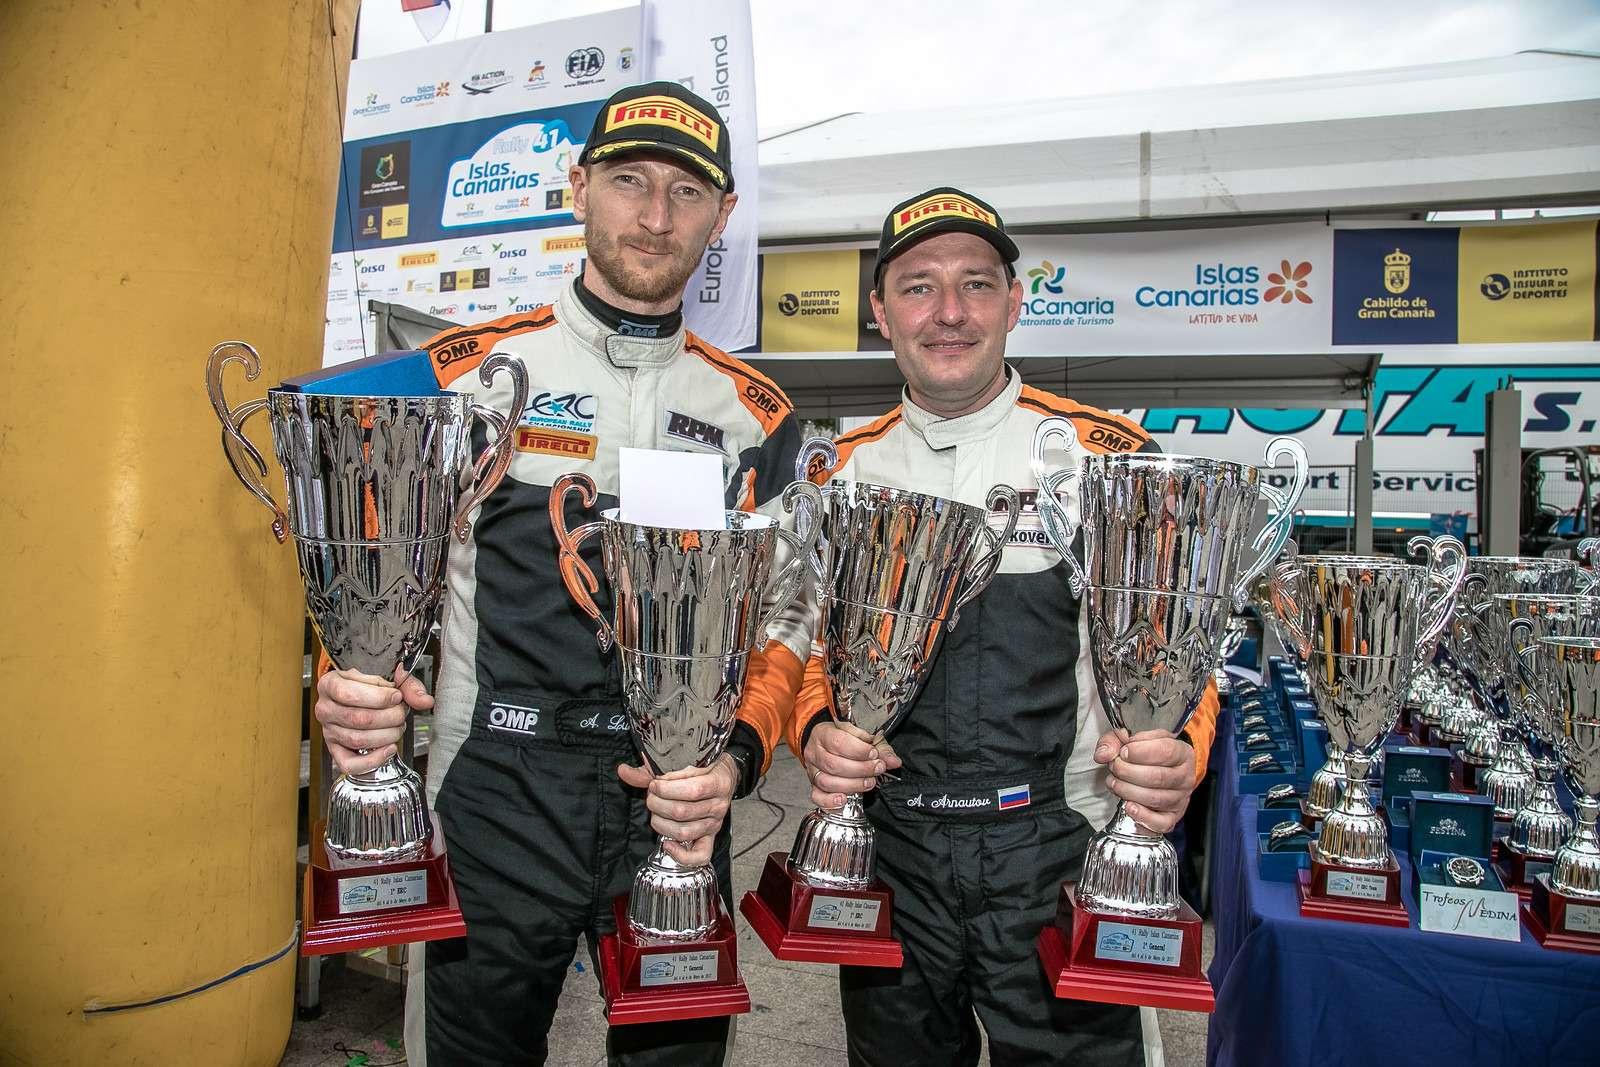 Алексей Лукьянюк, Алексей Арнаутов, FIA ERC, Ford Fiesta